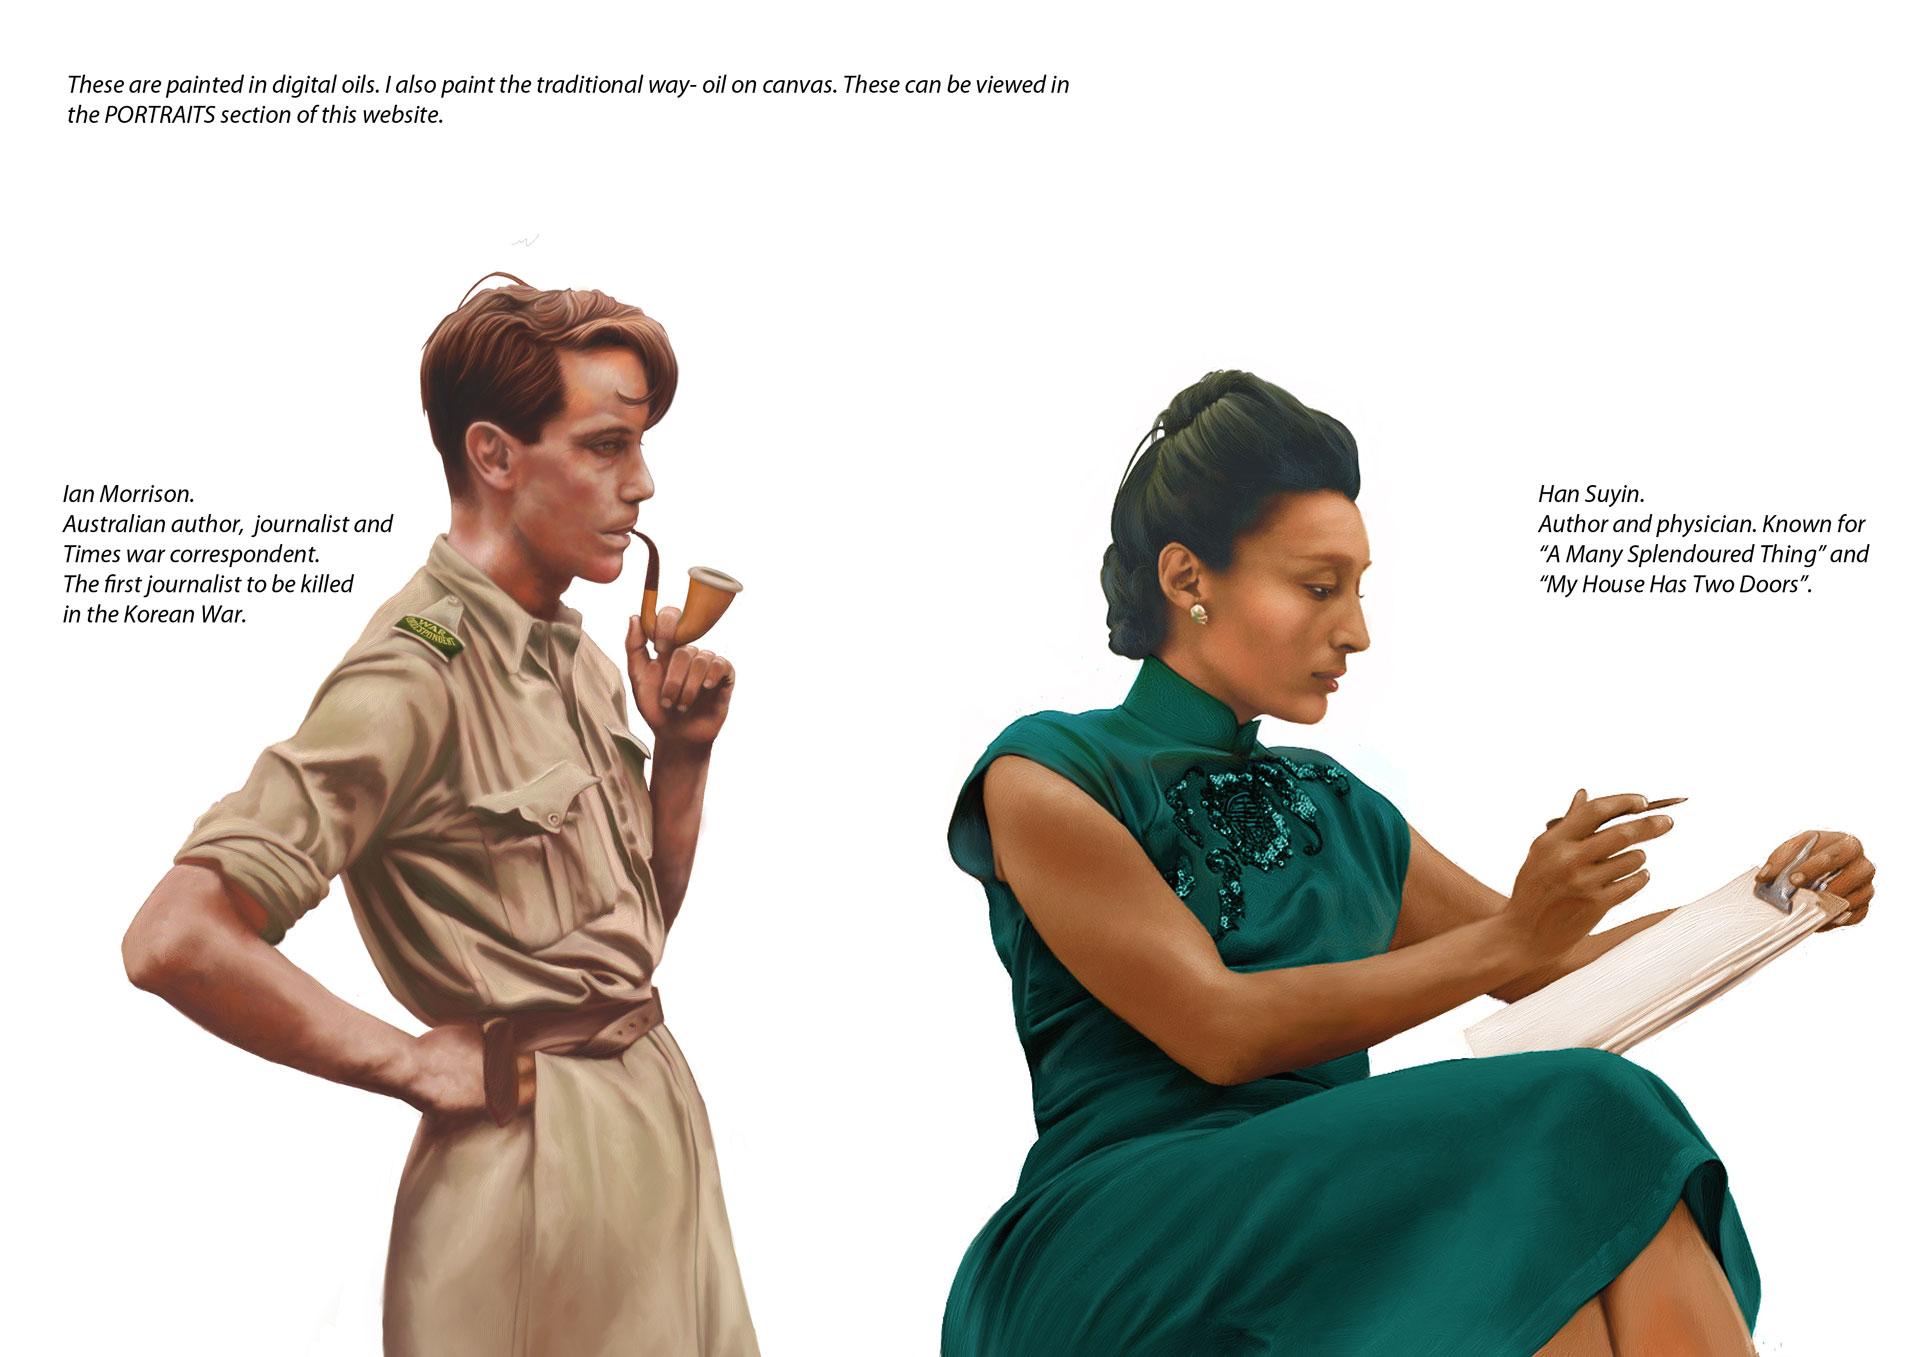 Han Suyin © Michael Payne Graphic Design